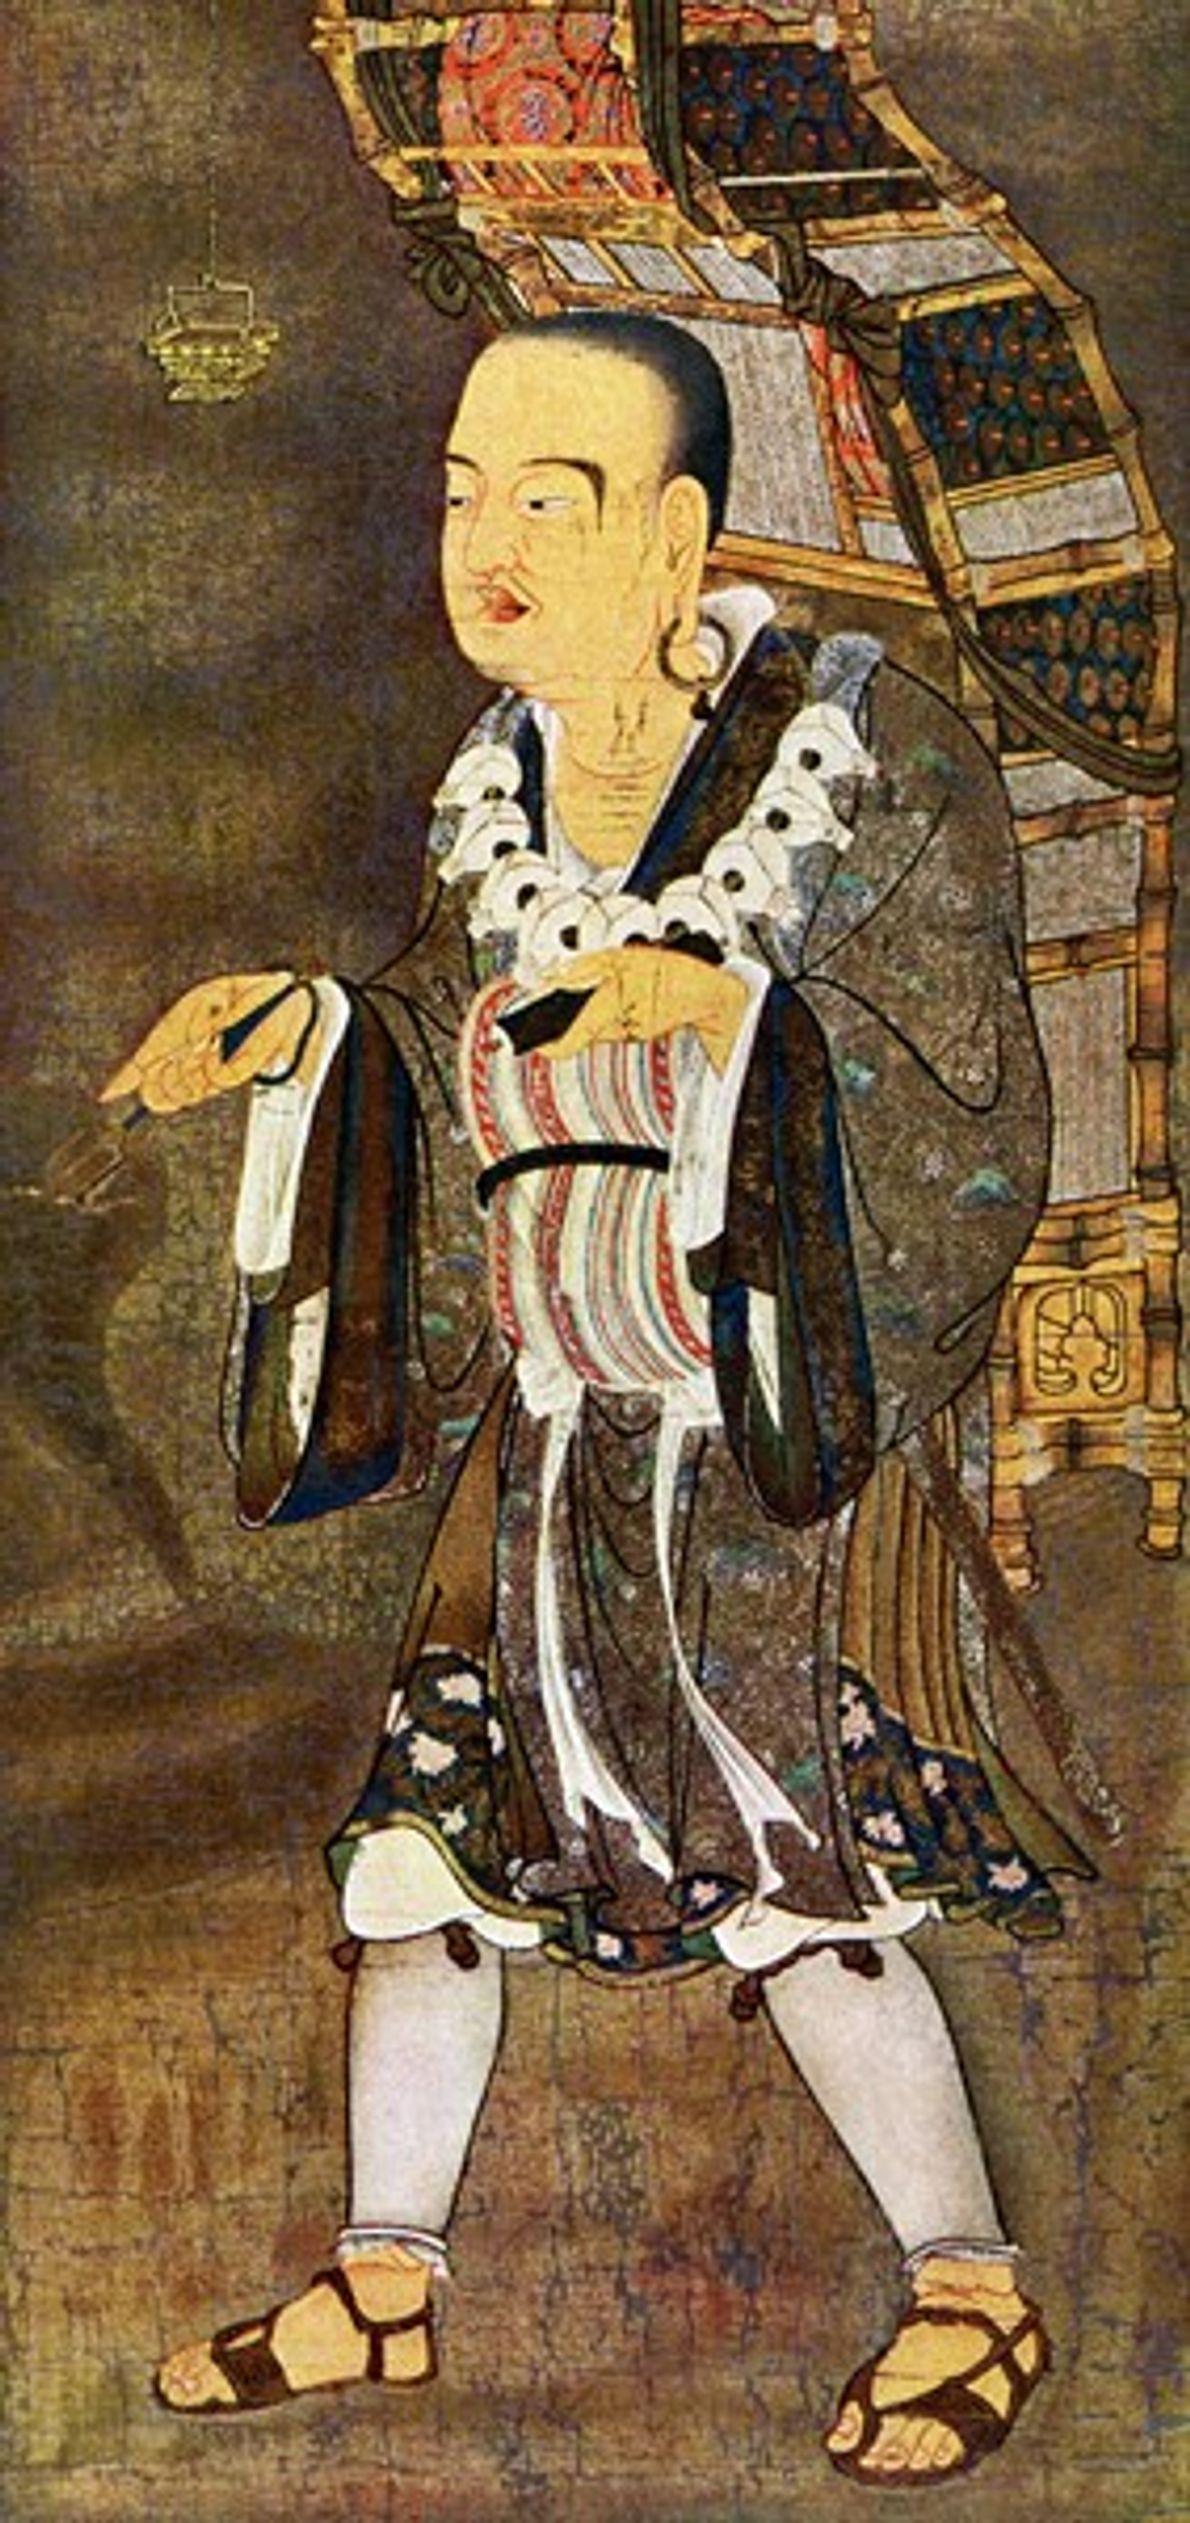 Xuanzang (602-664)